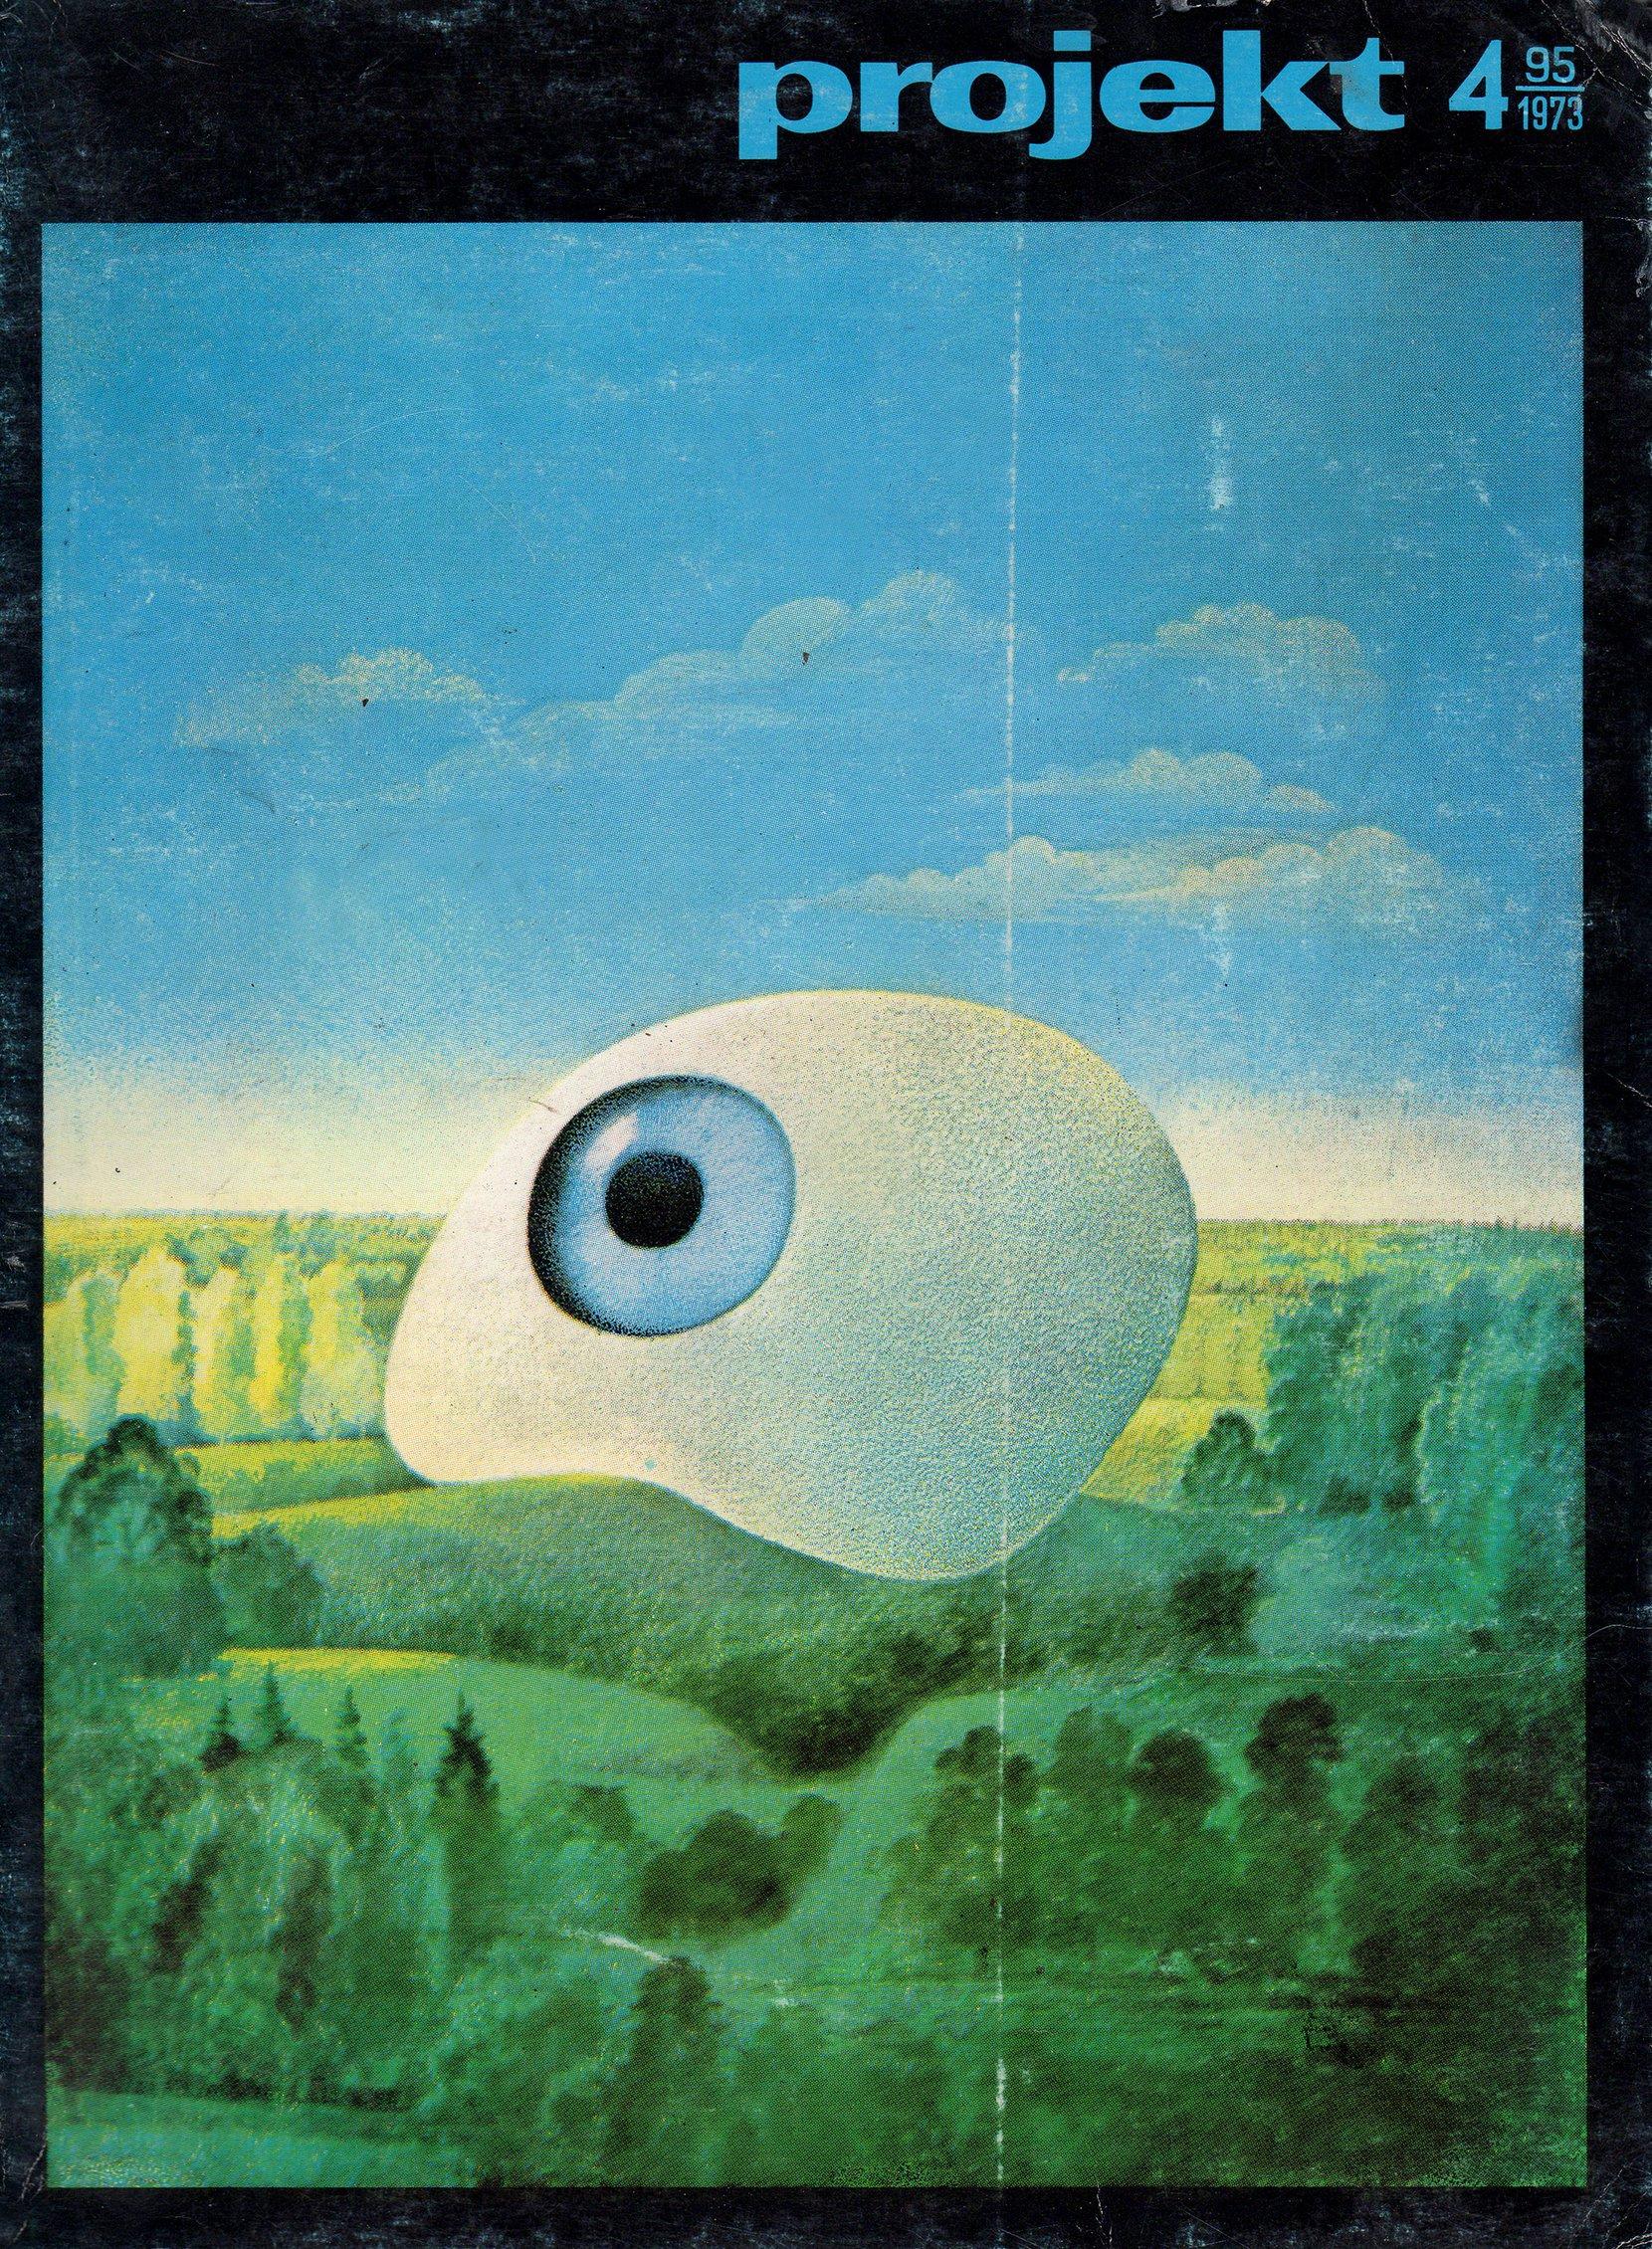 """projekt"" magazine, 1973-4 periodicals art & culture"